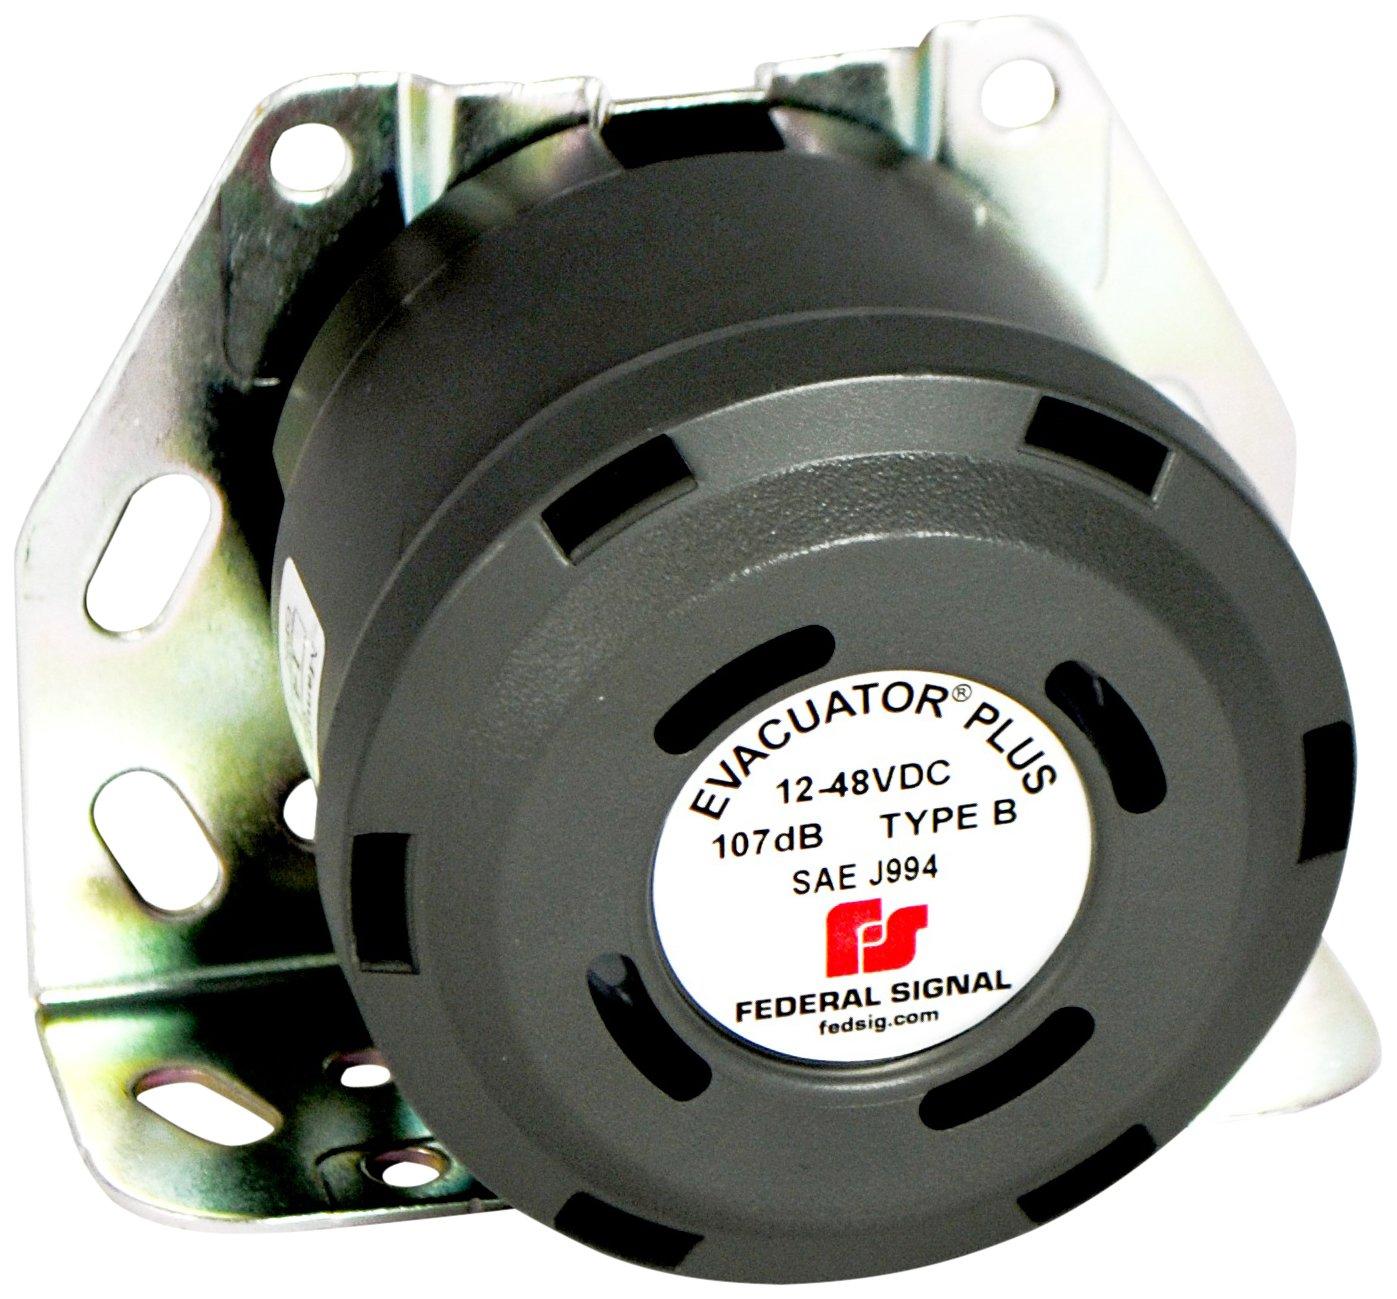 Federal Signal 201333SSG Evacuator Back-Up Alarm, Dual Function Universal mount